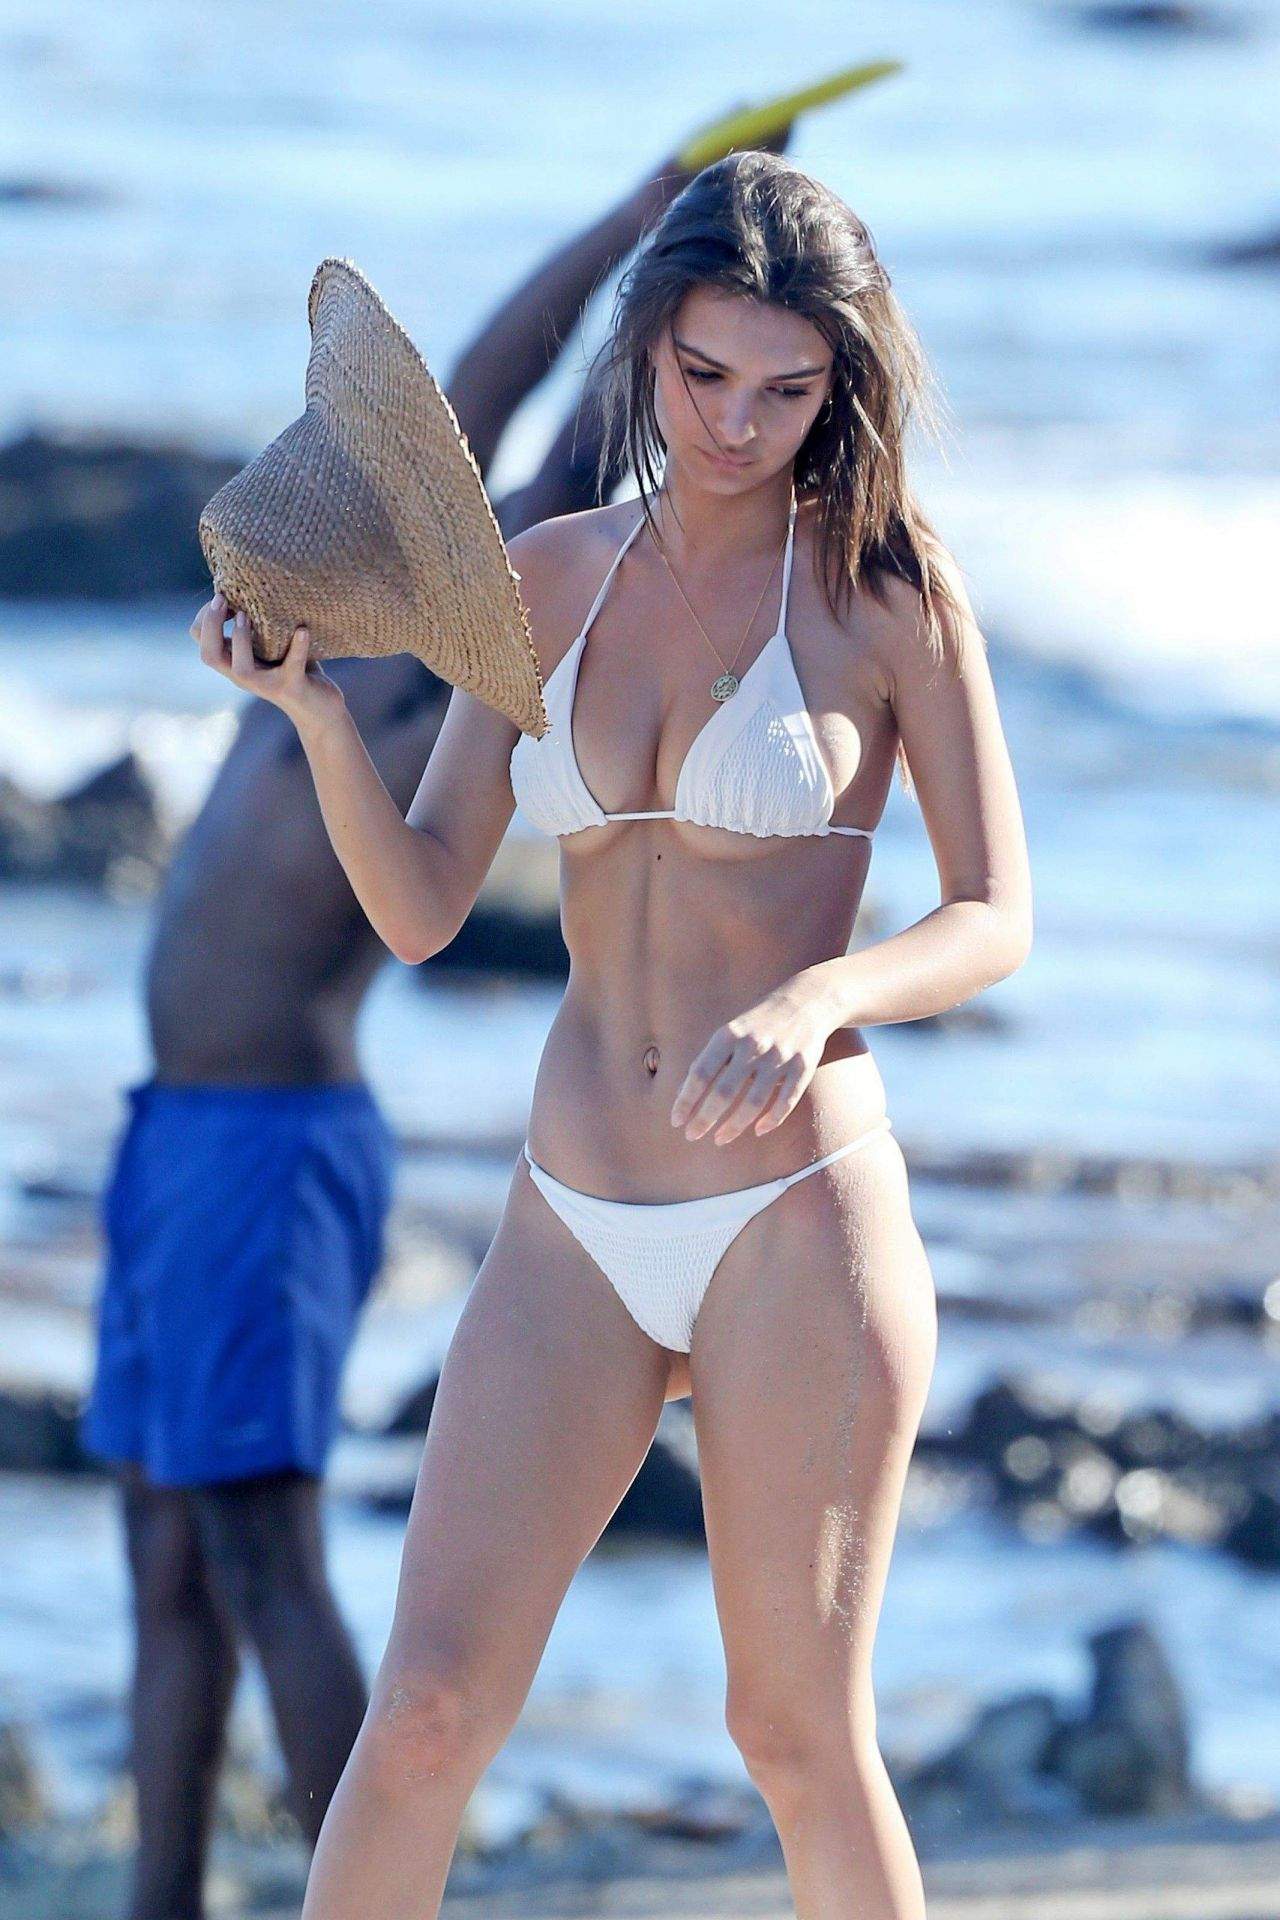 Sophie Mudd in Red Bikini on the beach in Malibu Pic 7 of 35